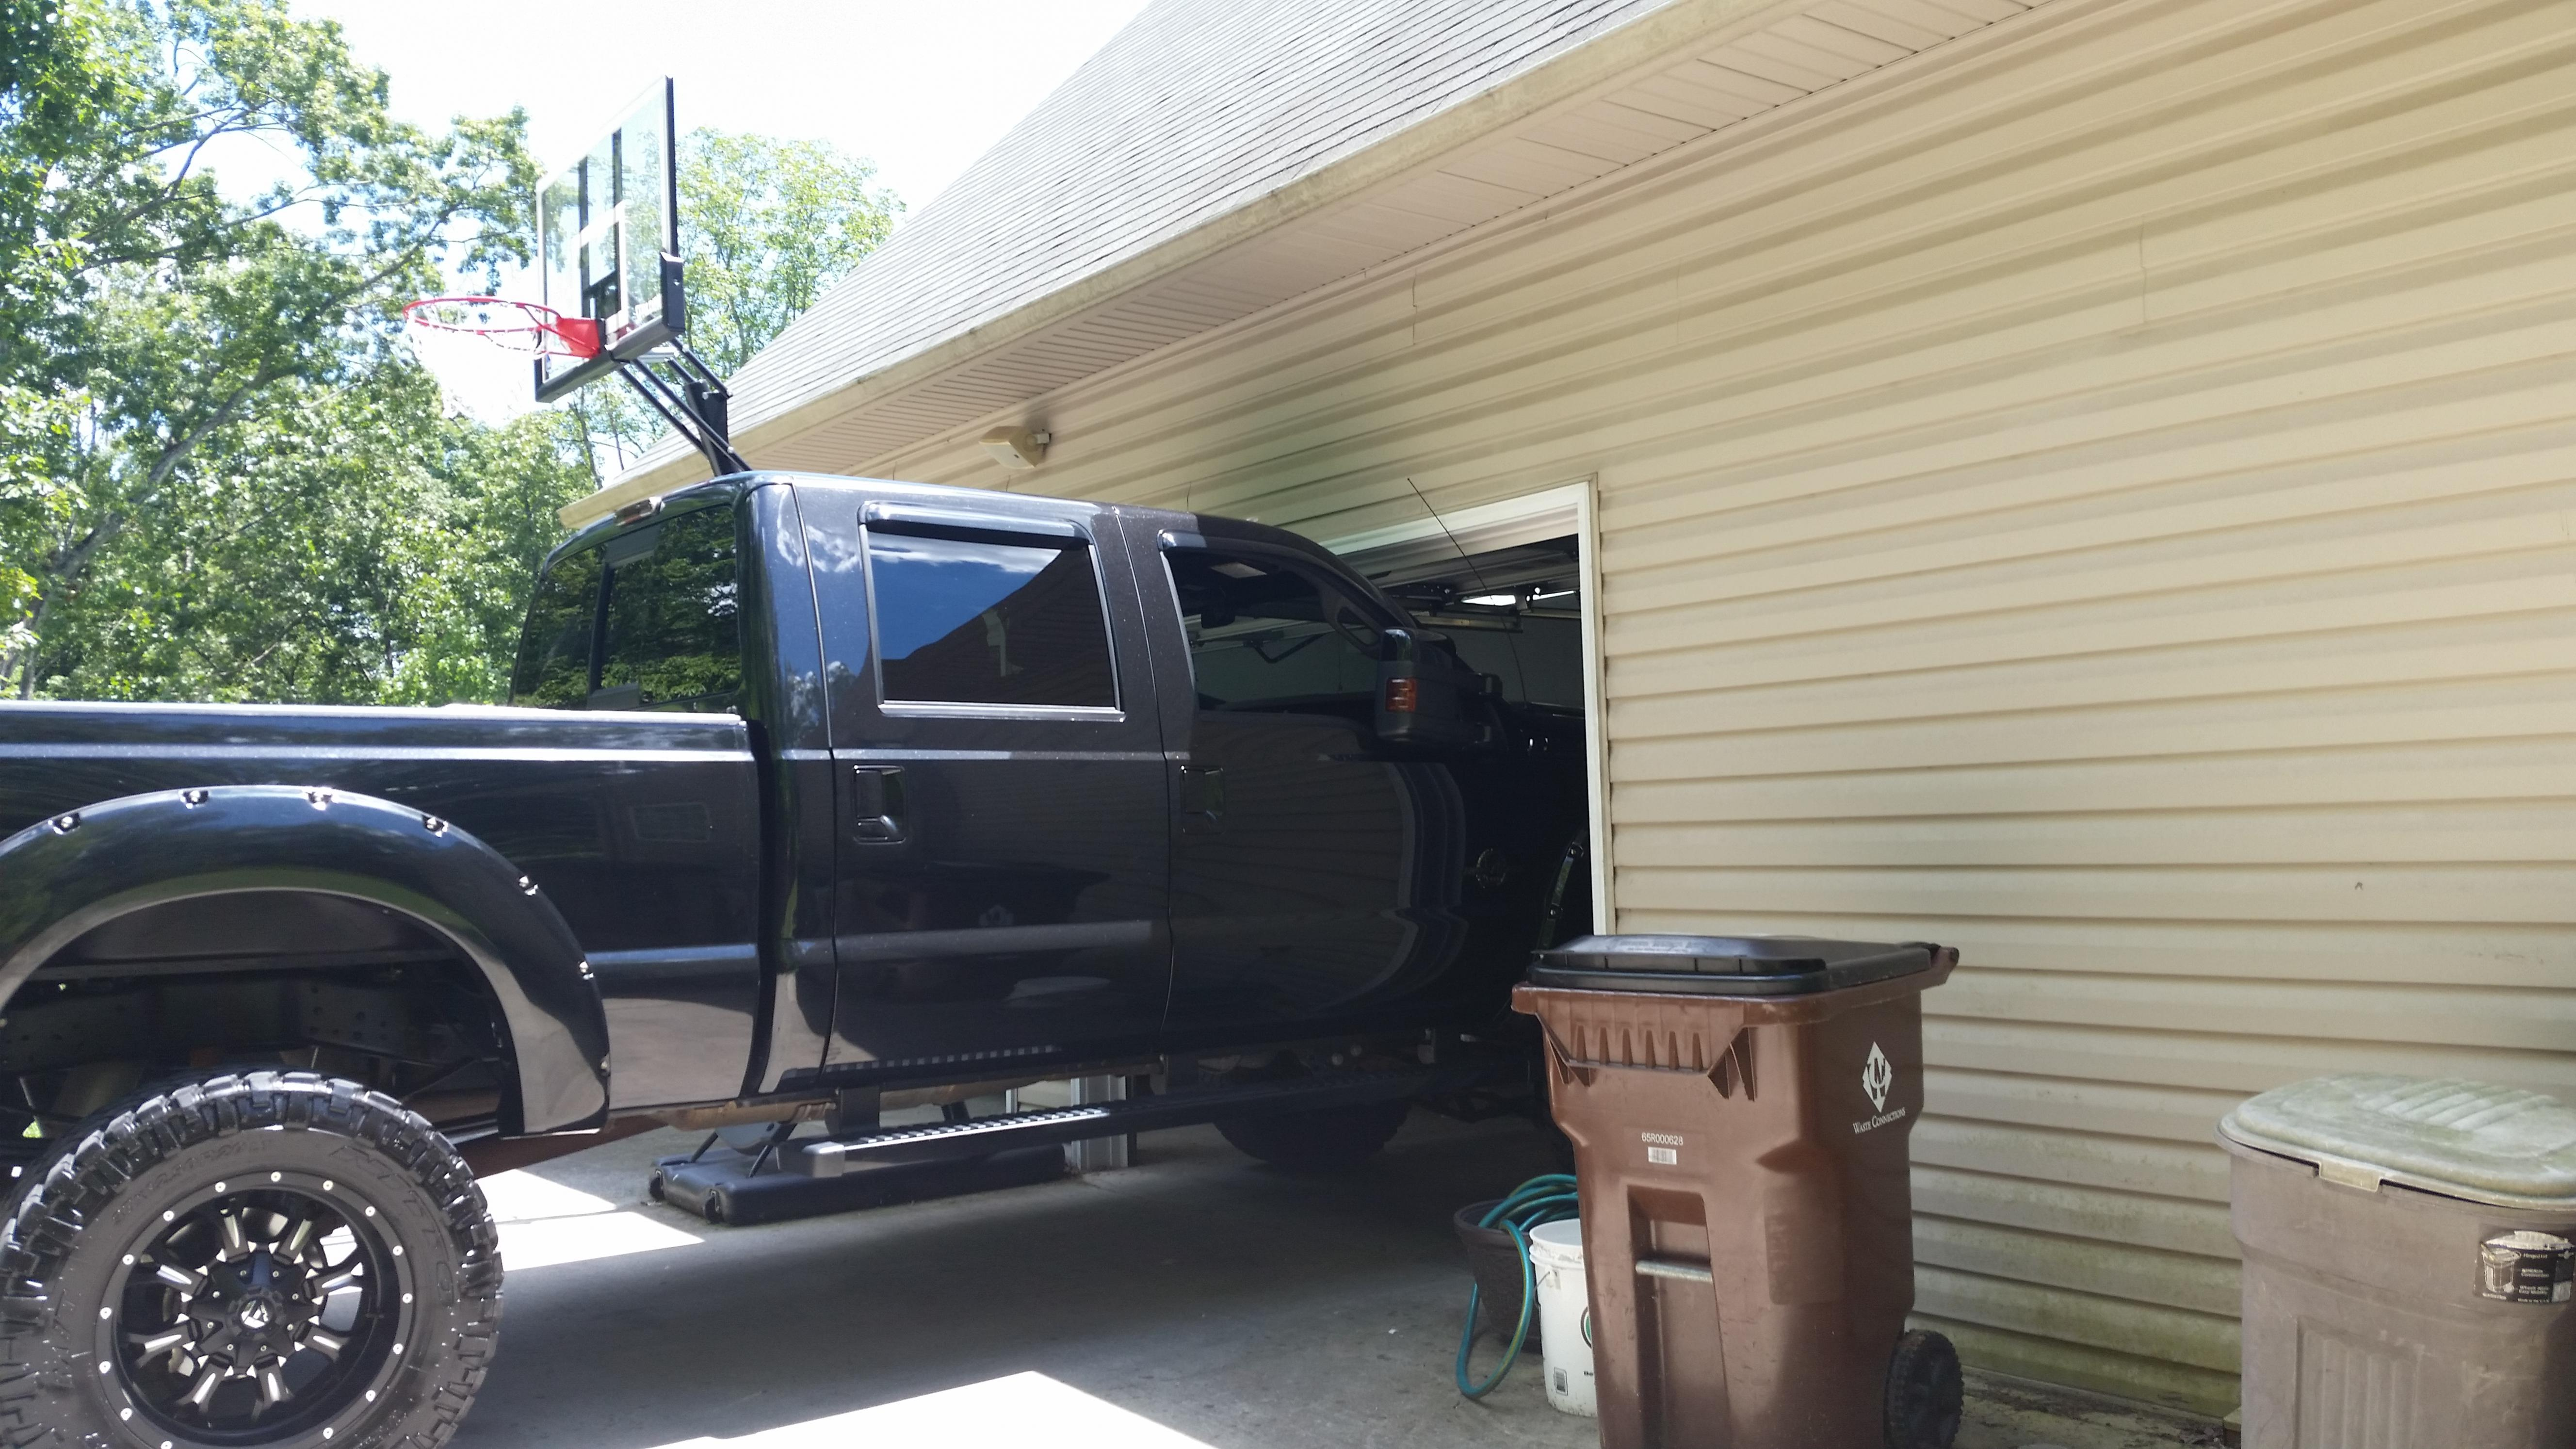 2012 ford f350 6 7l b20 gas mileage help 20150801_135713 jpg